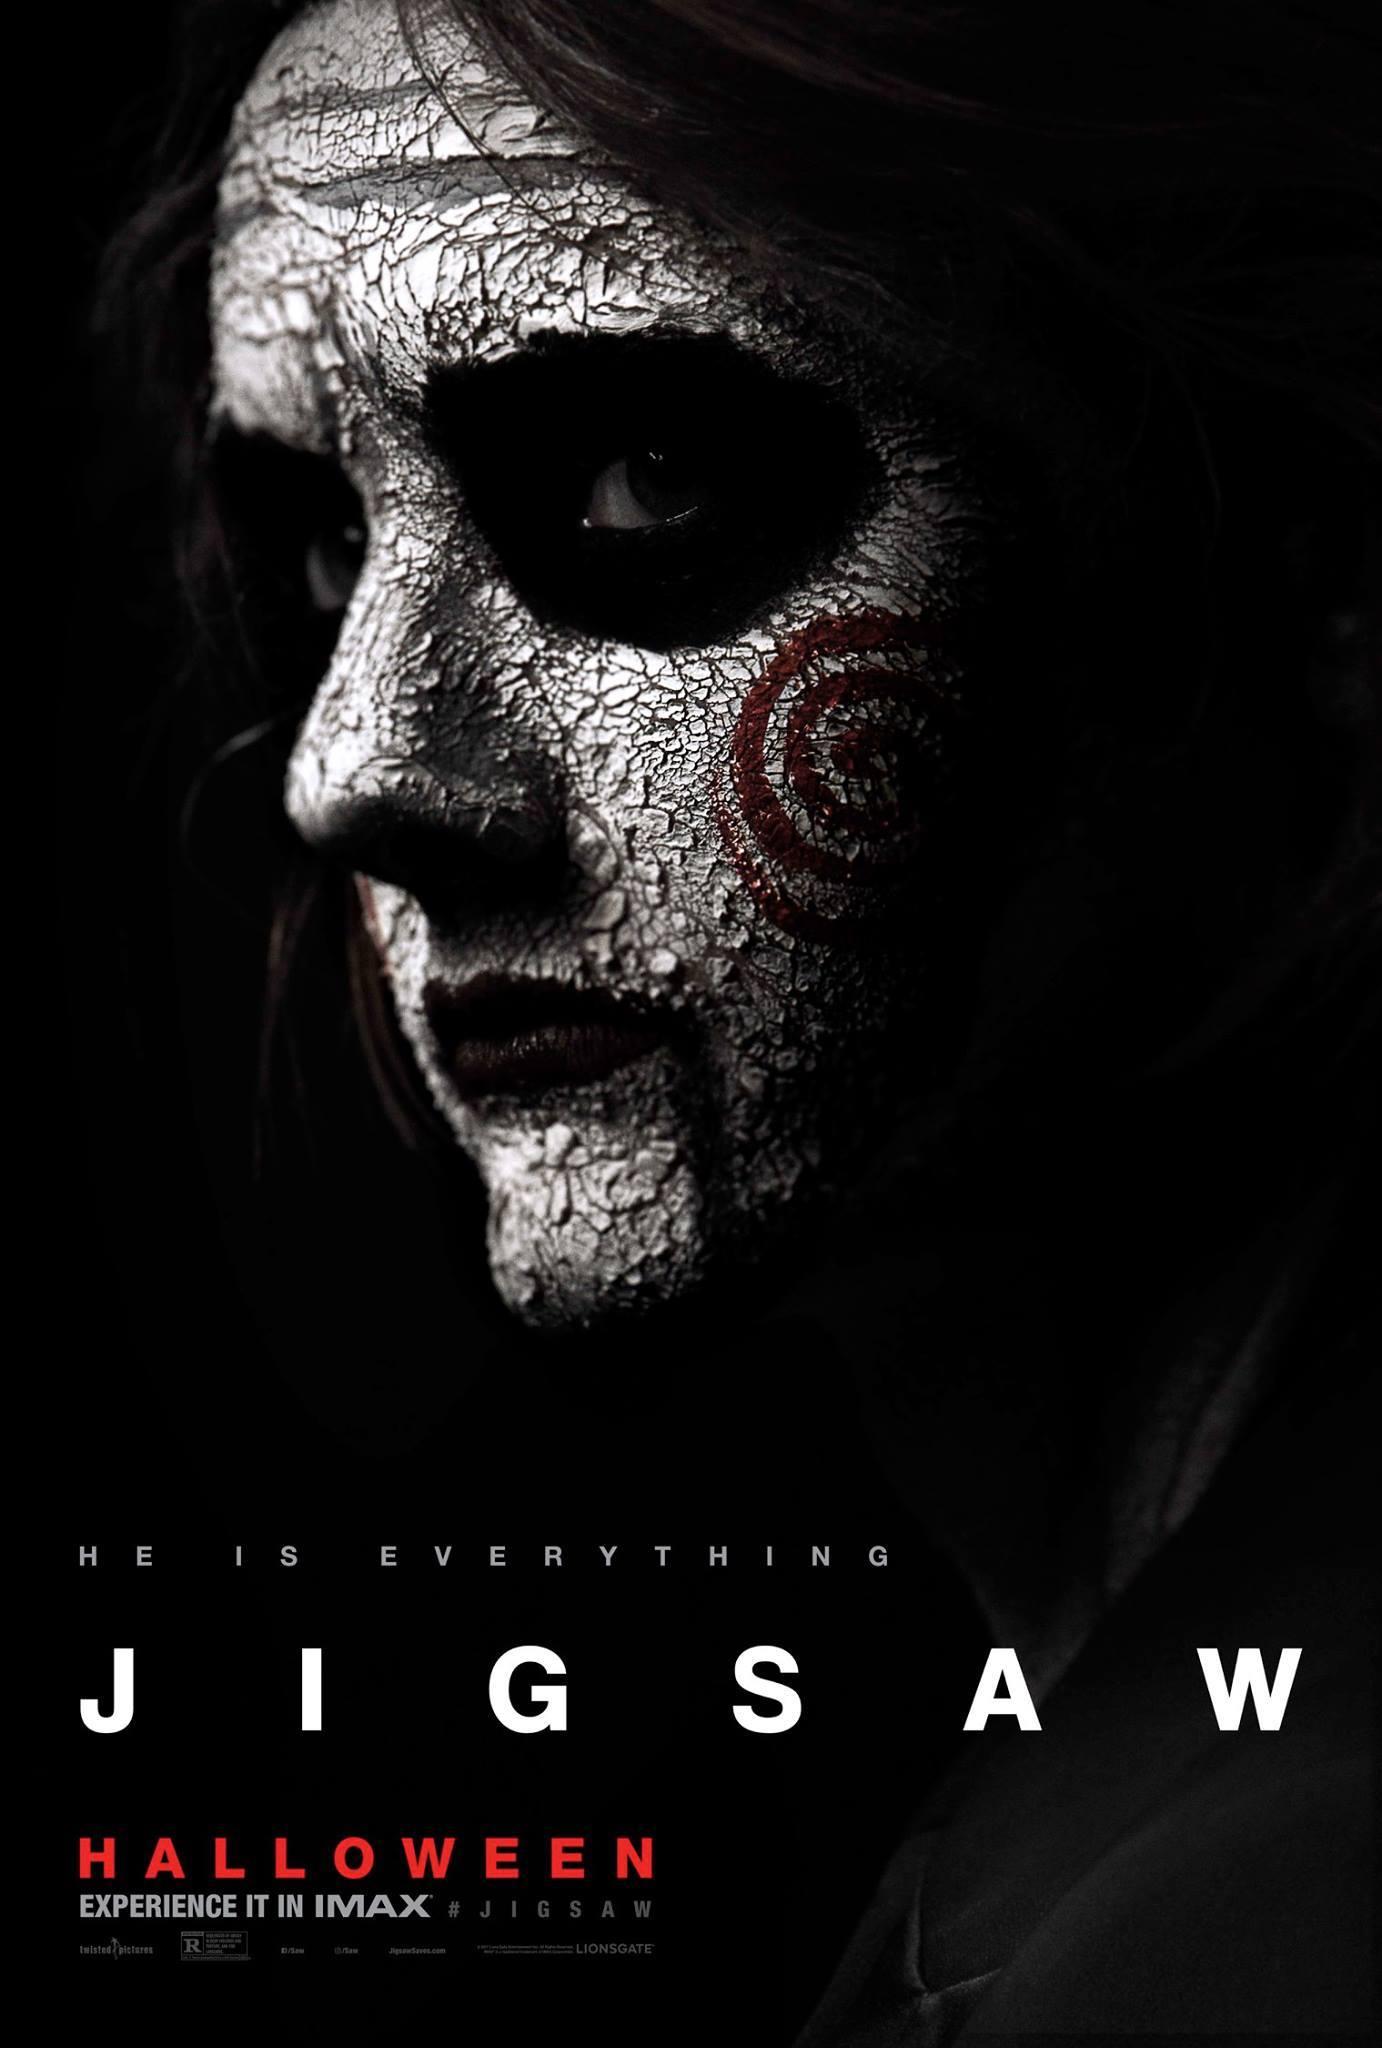 Jigsaw character5